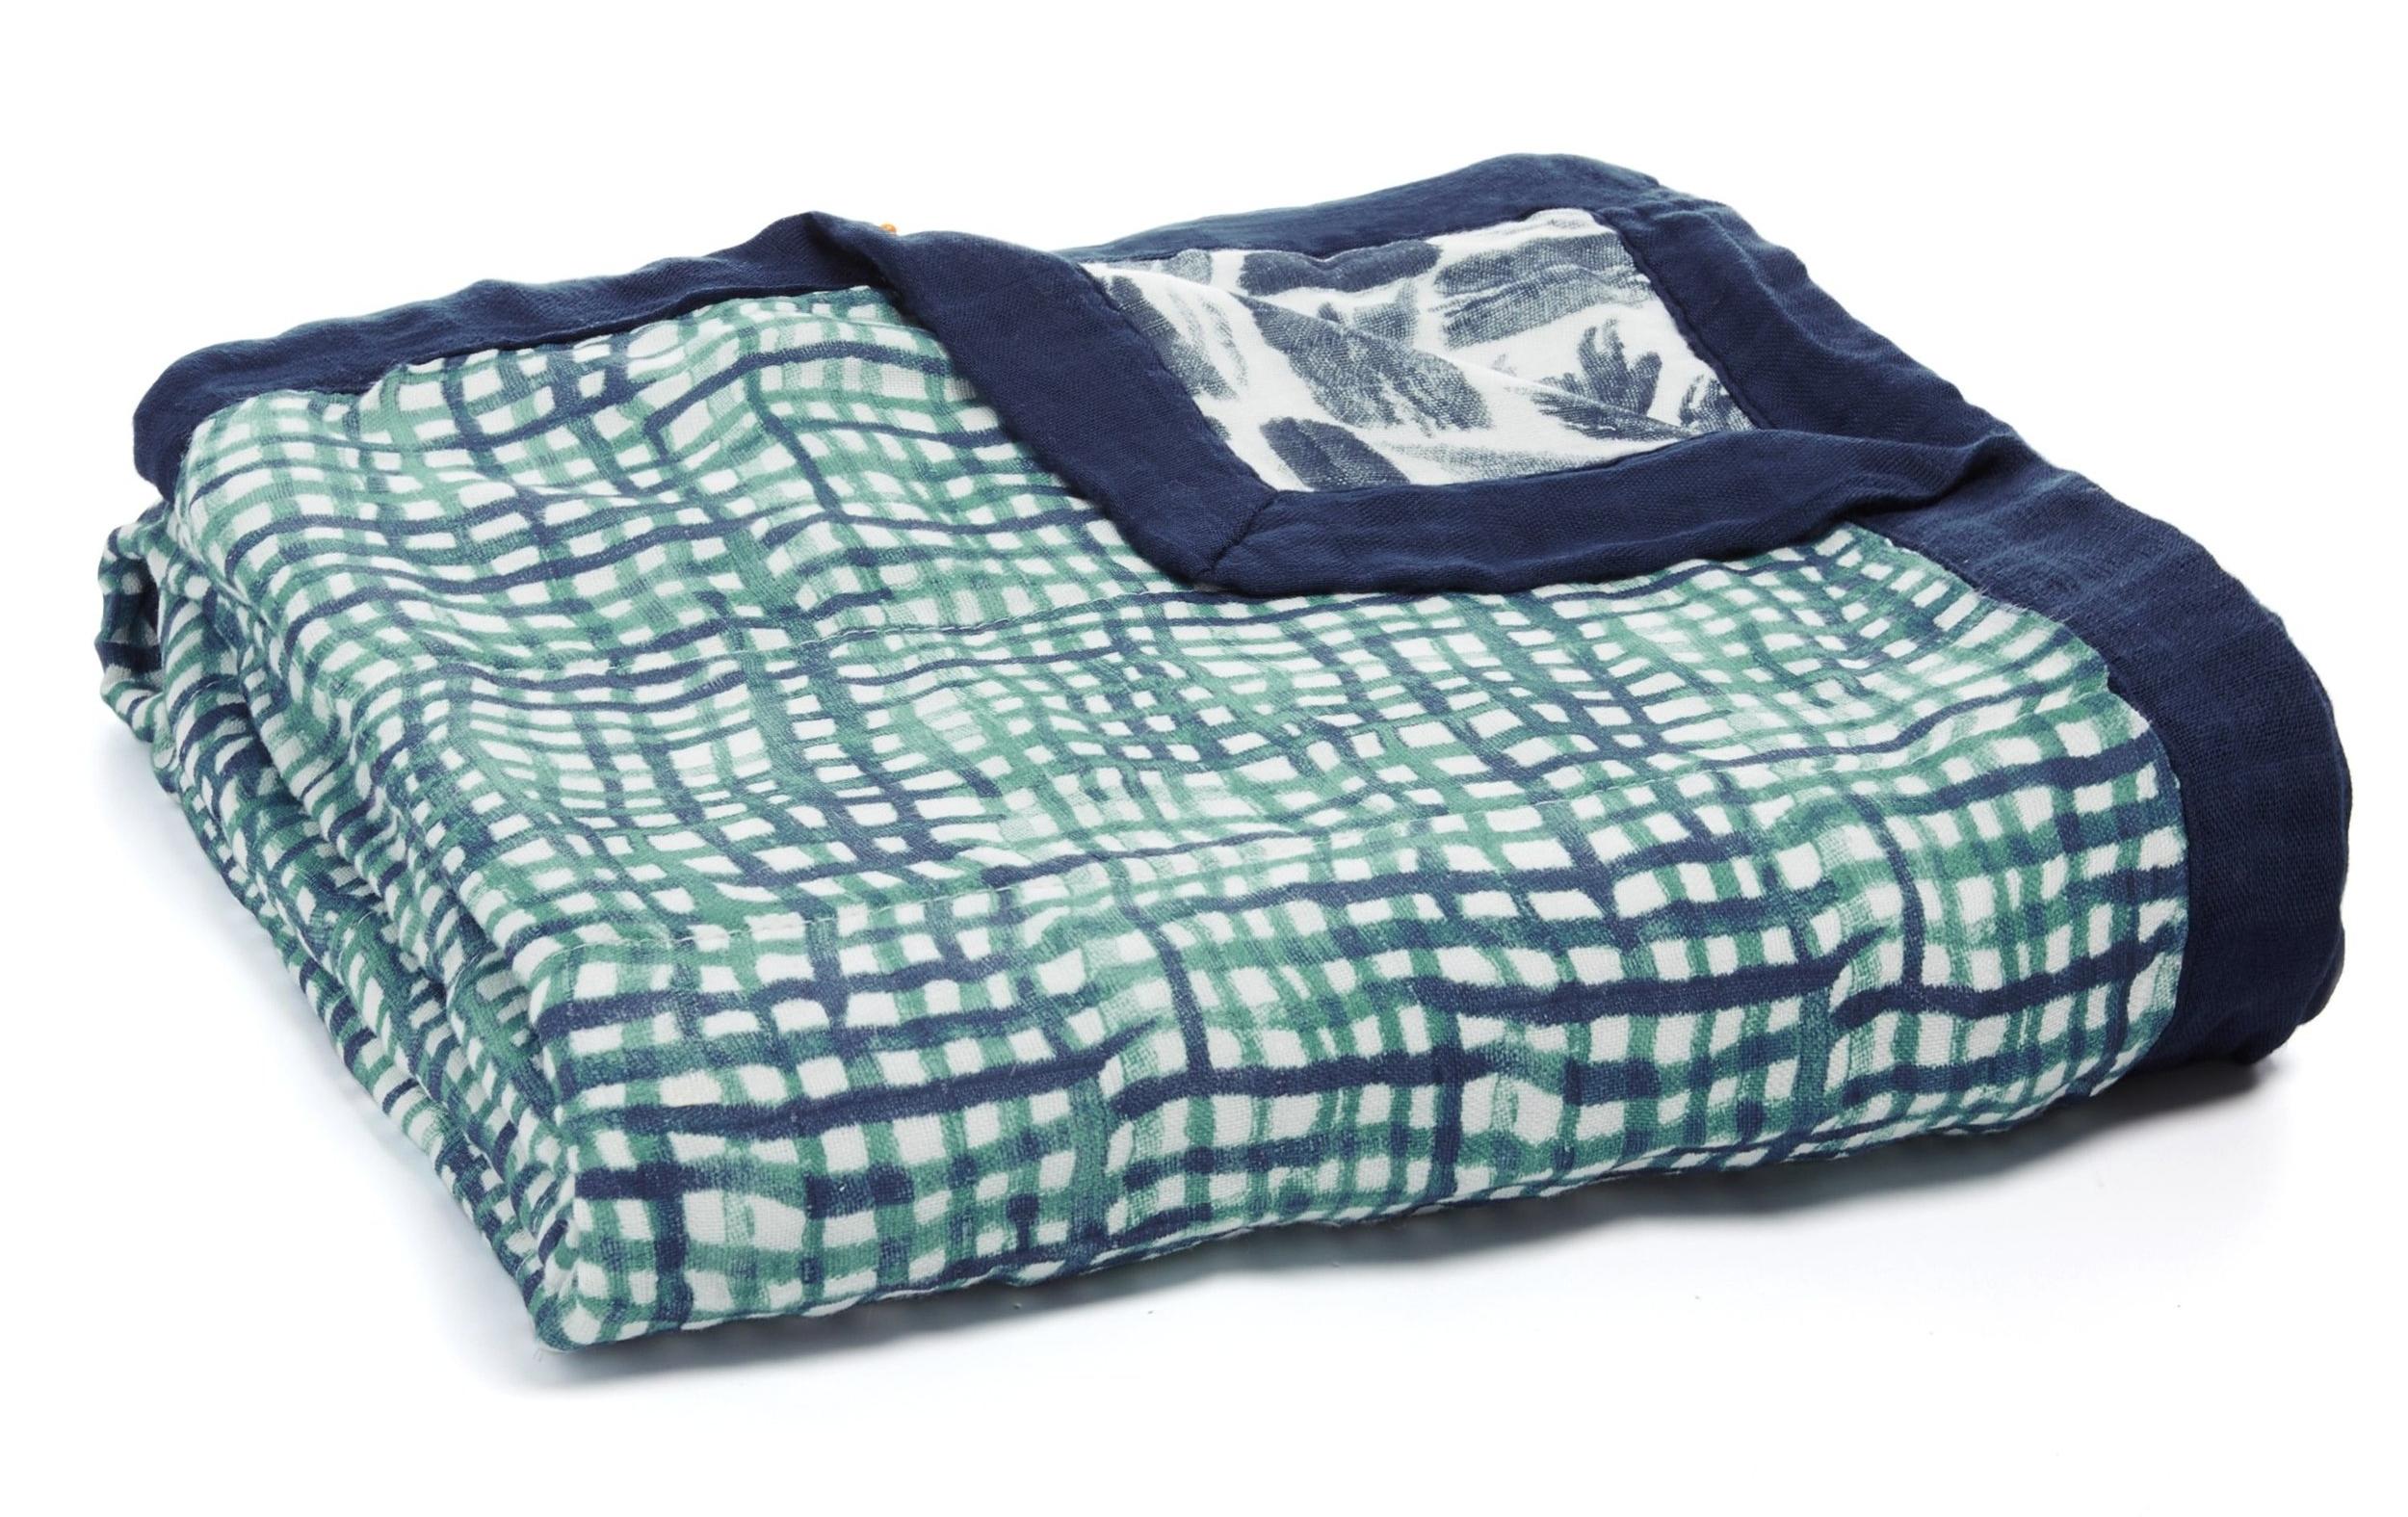 aden-anais-baby-silky-soft-dream-blanket-seaport_1-9326.jpg